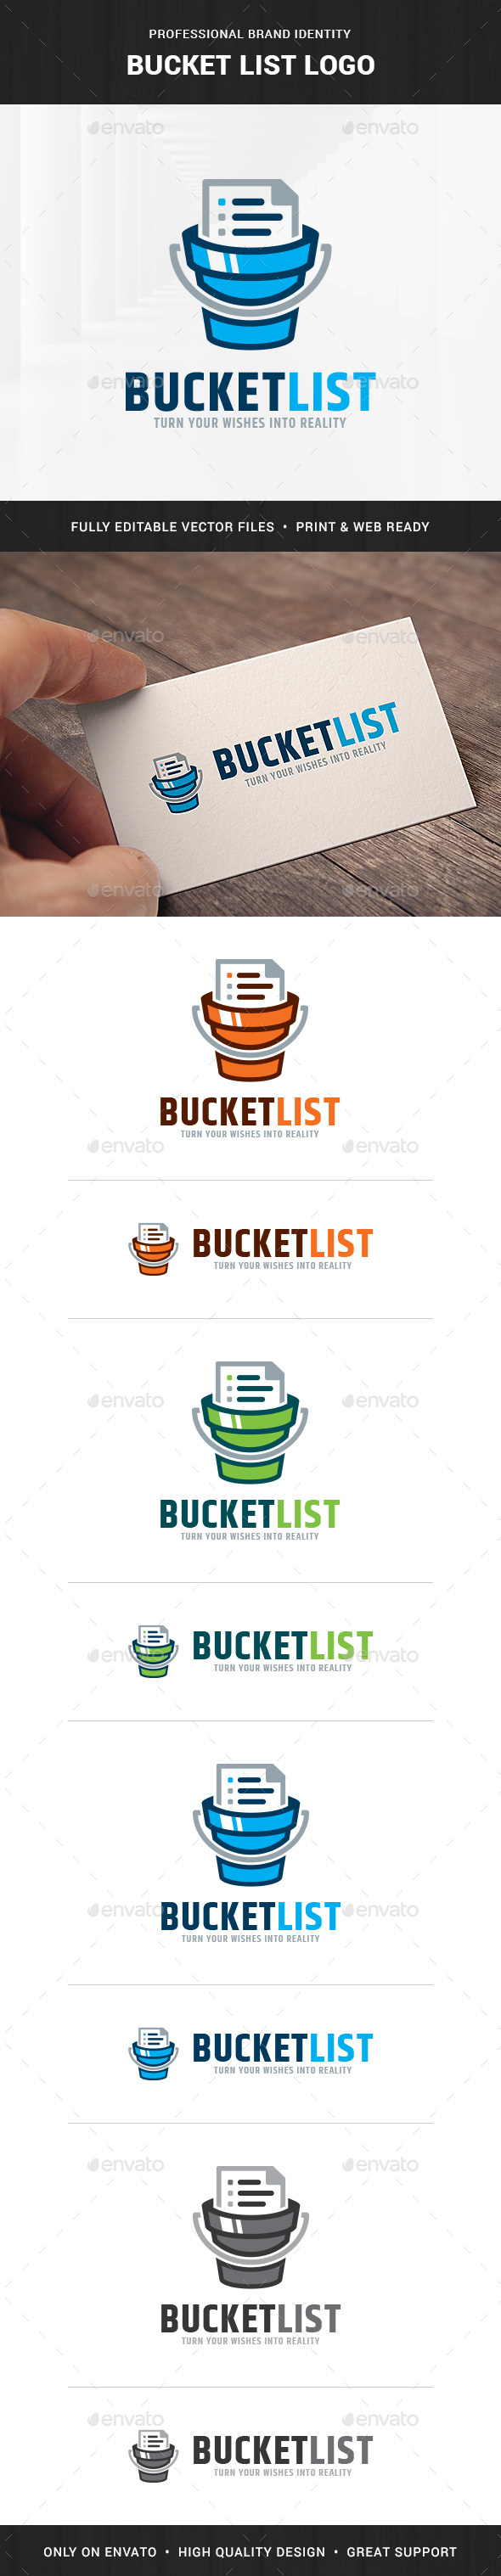 Bucket List Logo Template - Objects Logo Templates